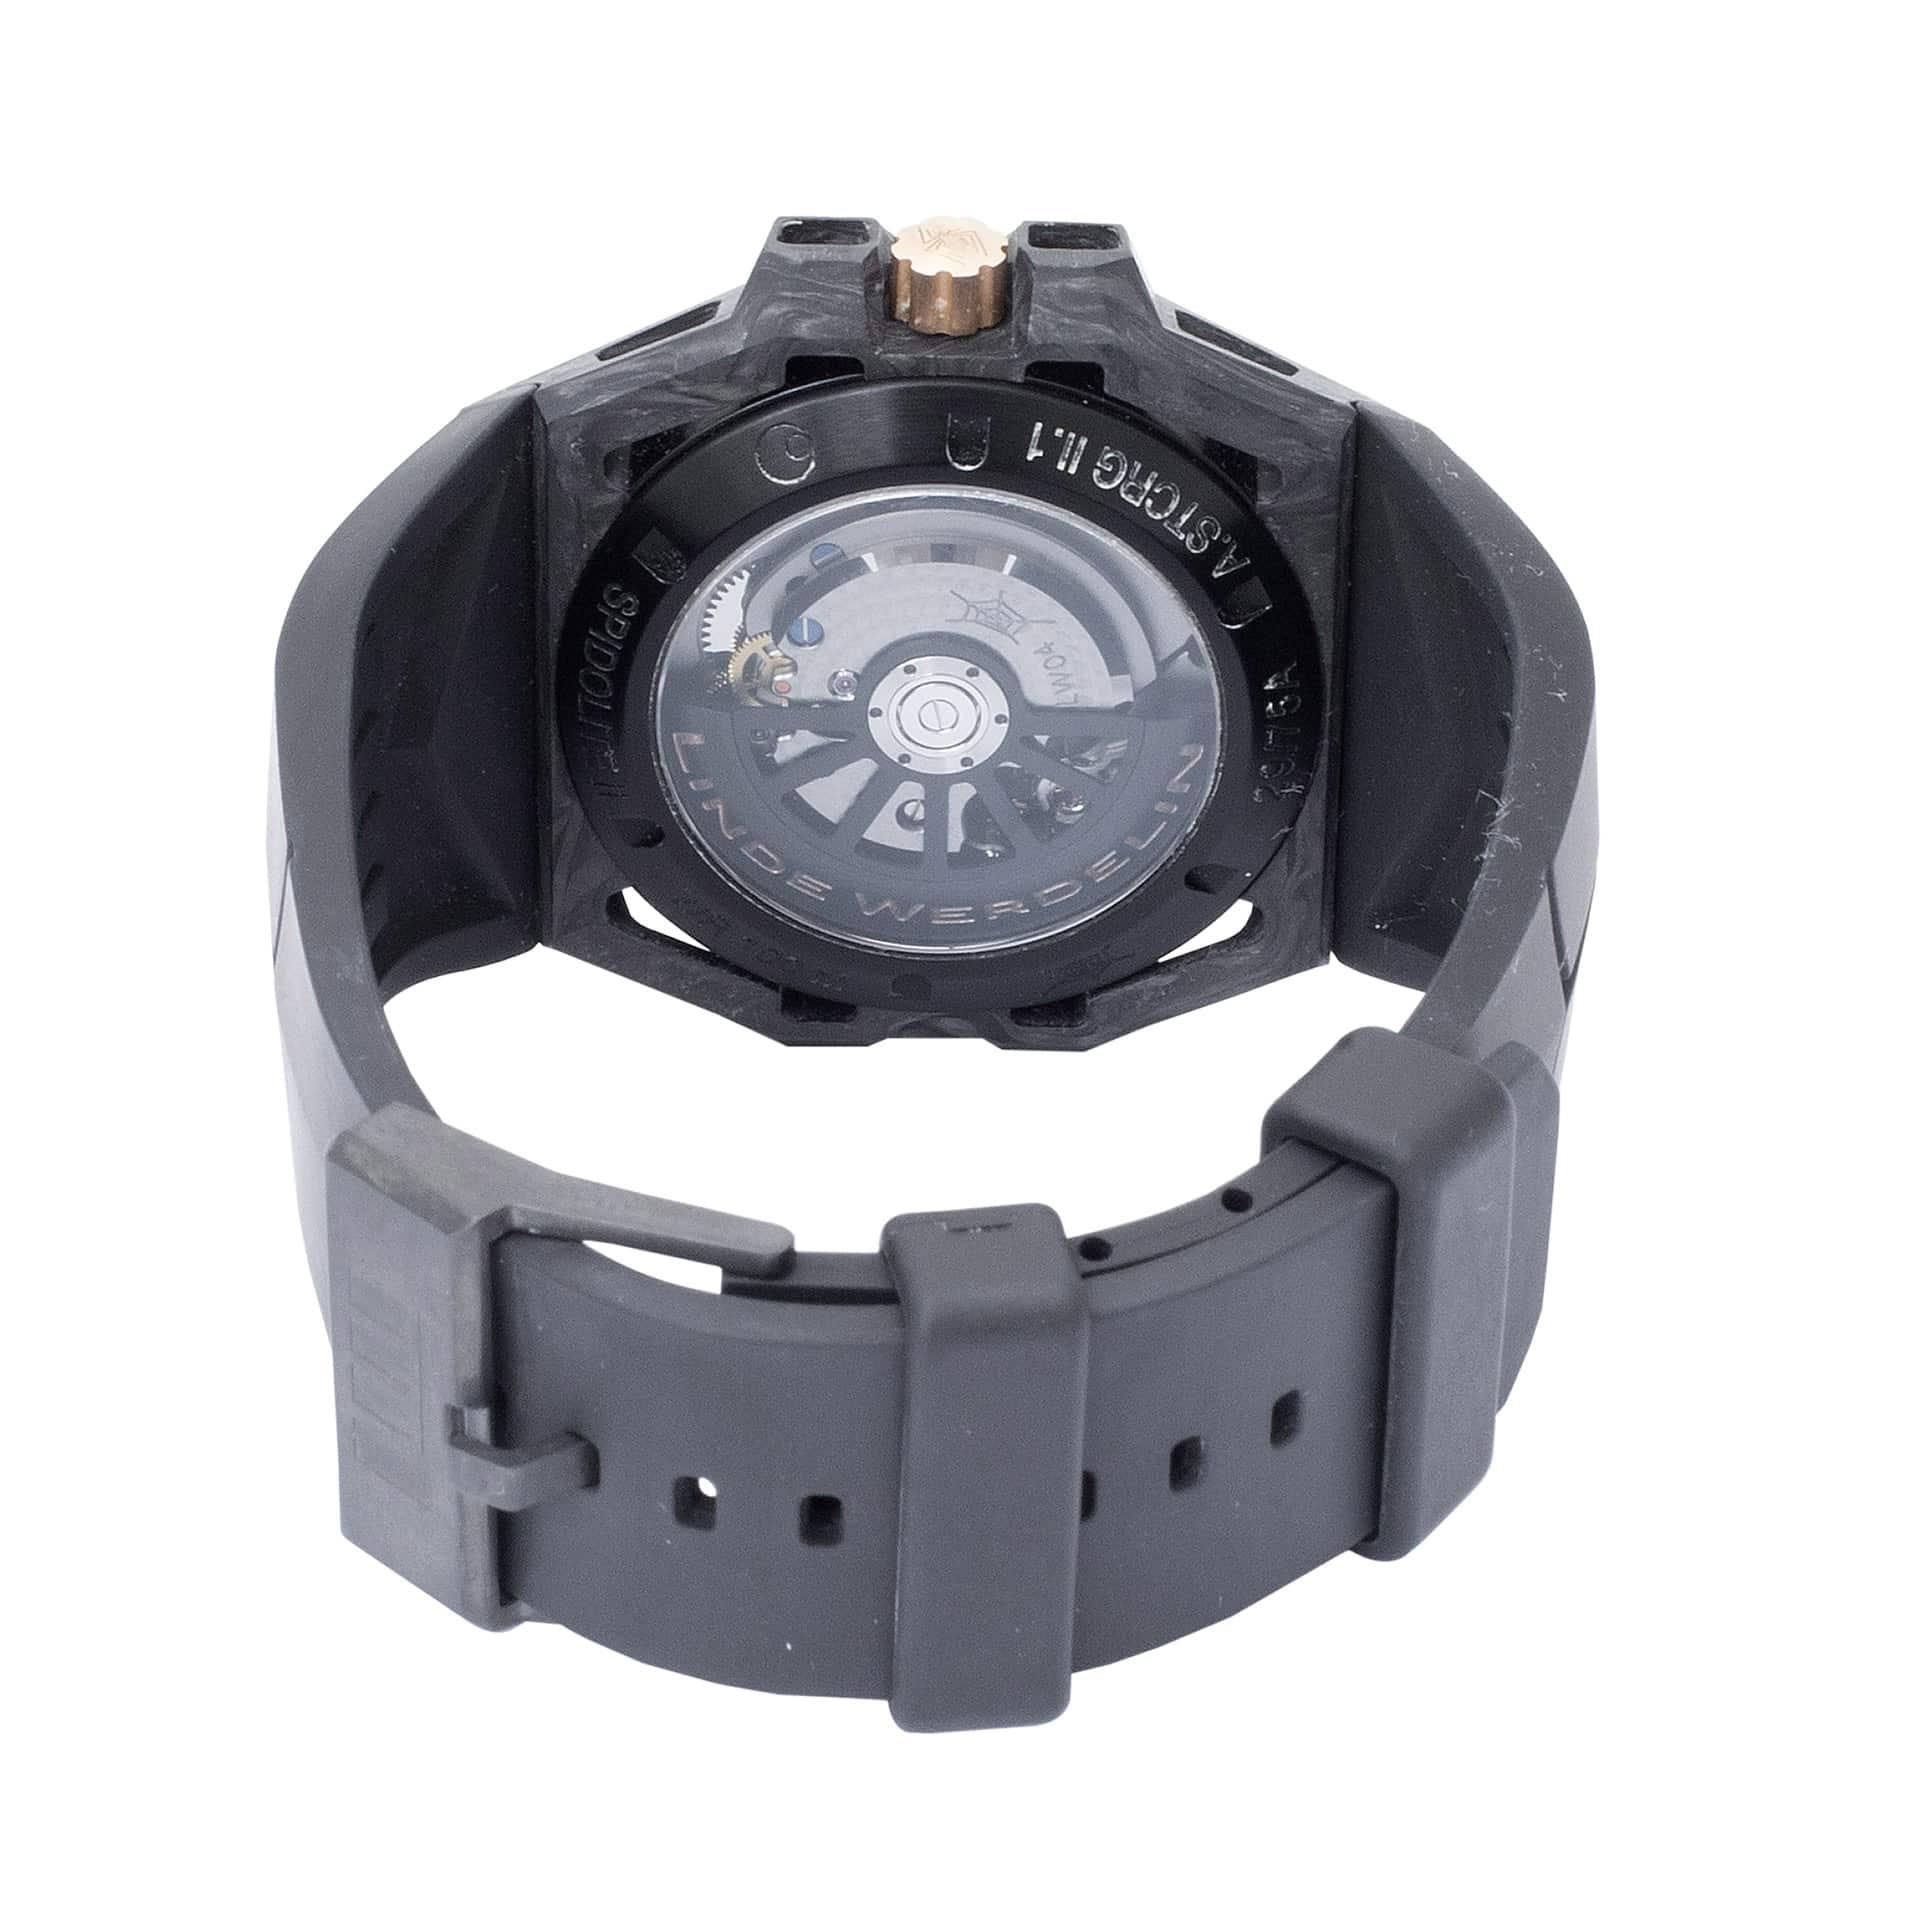 Lindewerdelin SpidoLite Watch